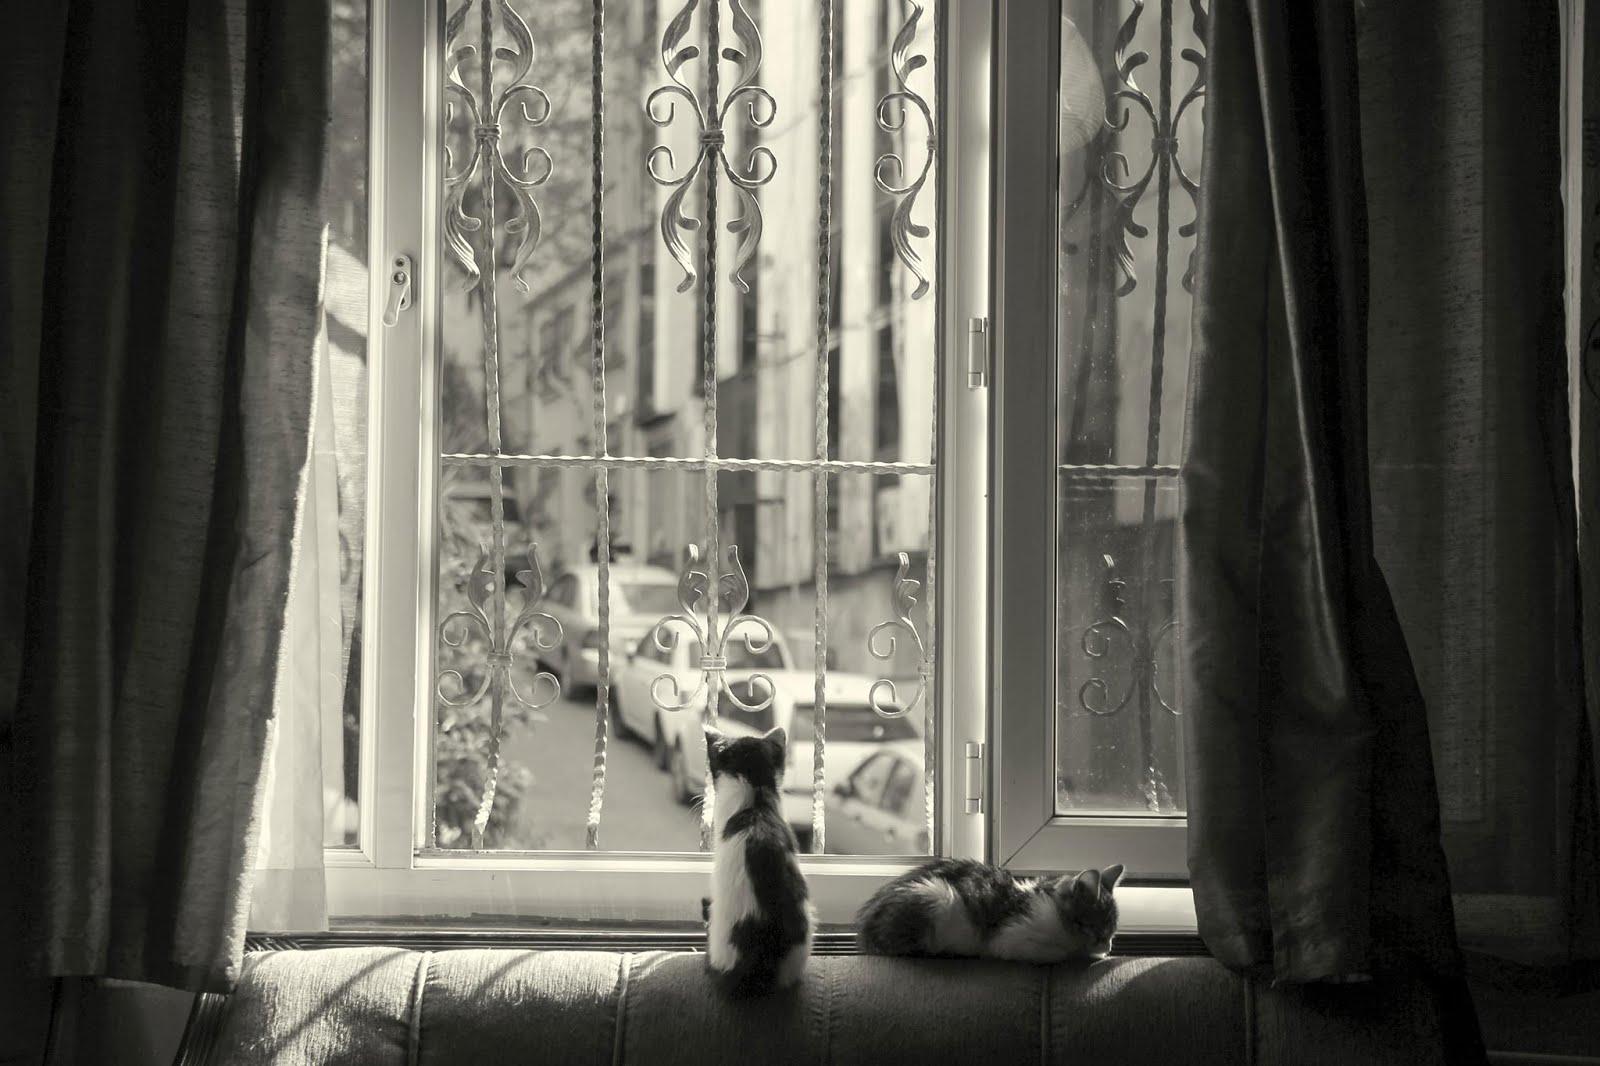 stray cat hostel